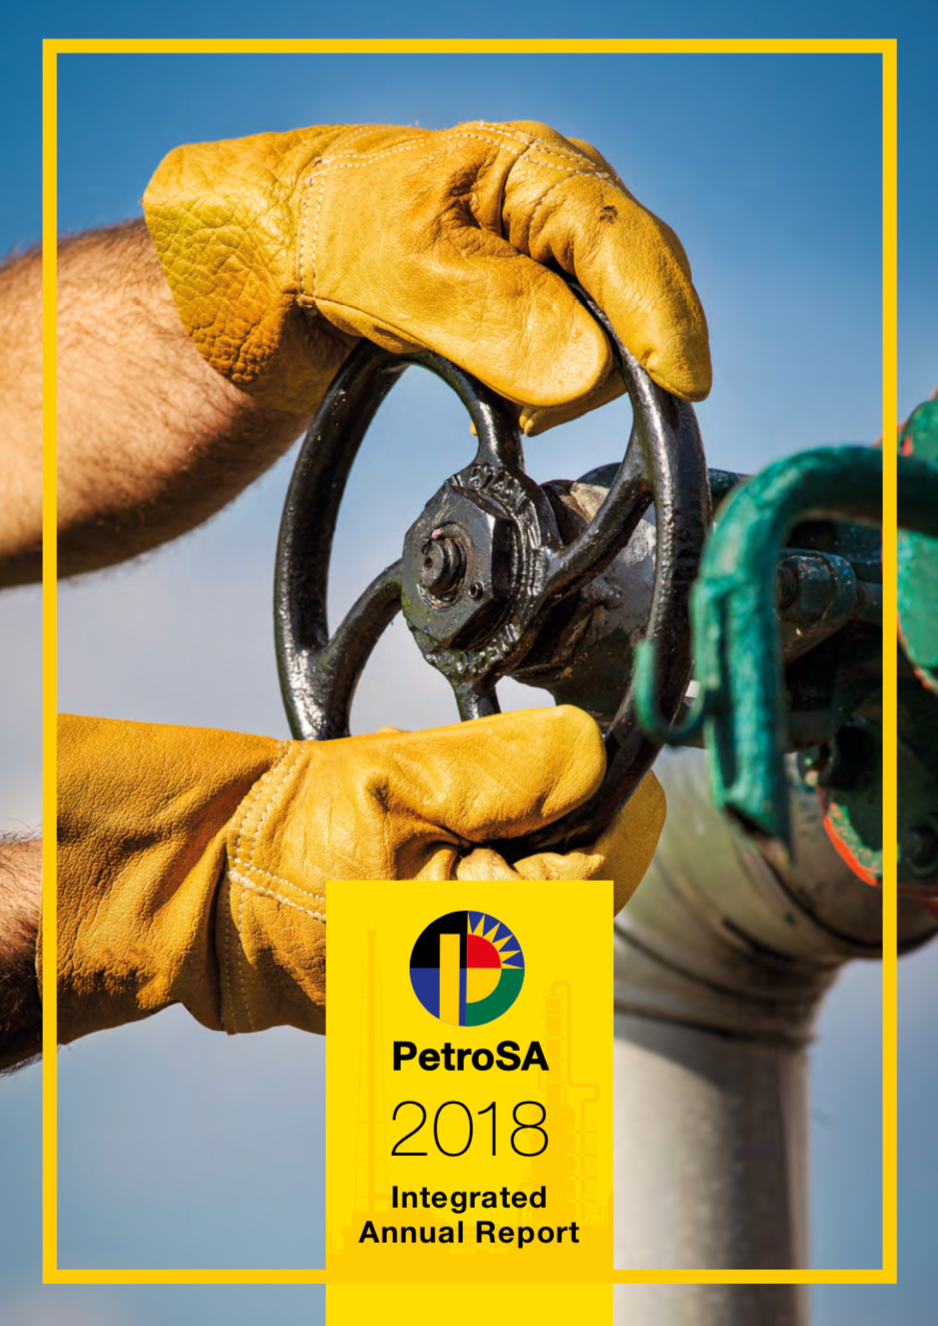 PetroSA annual report